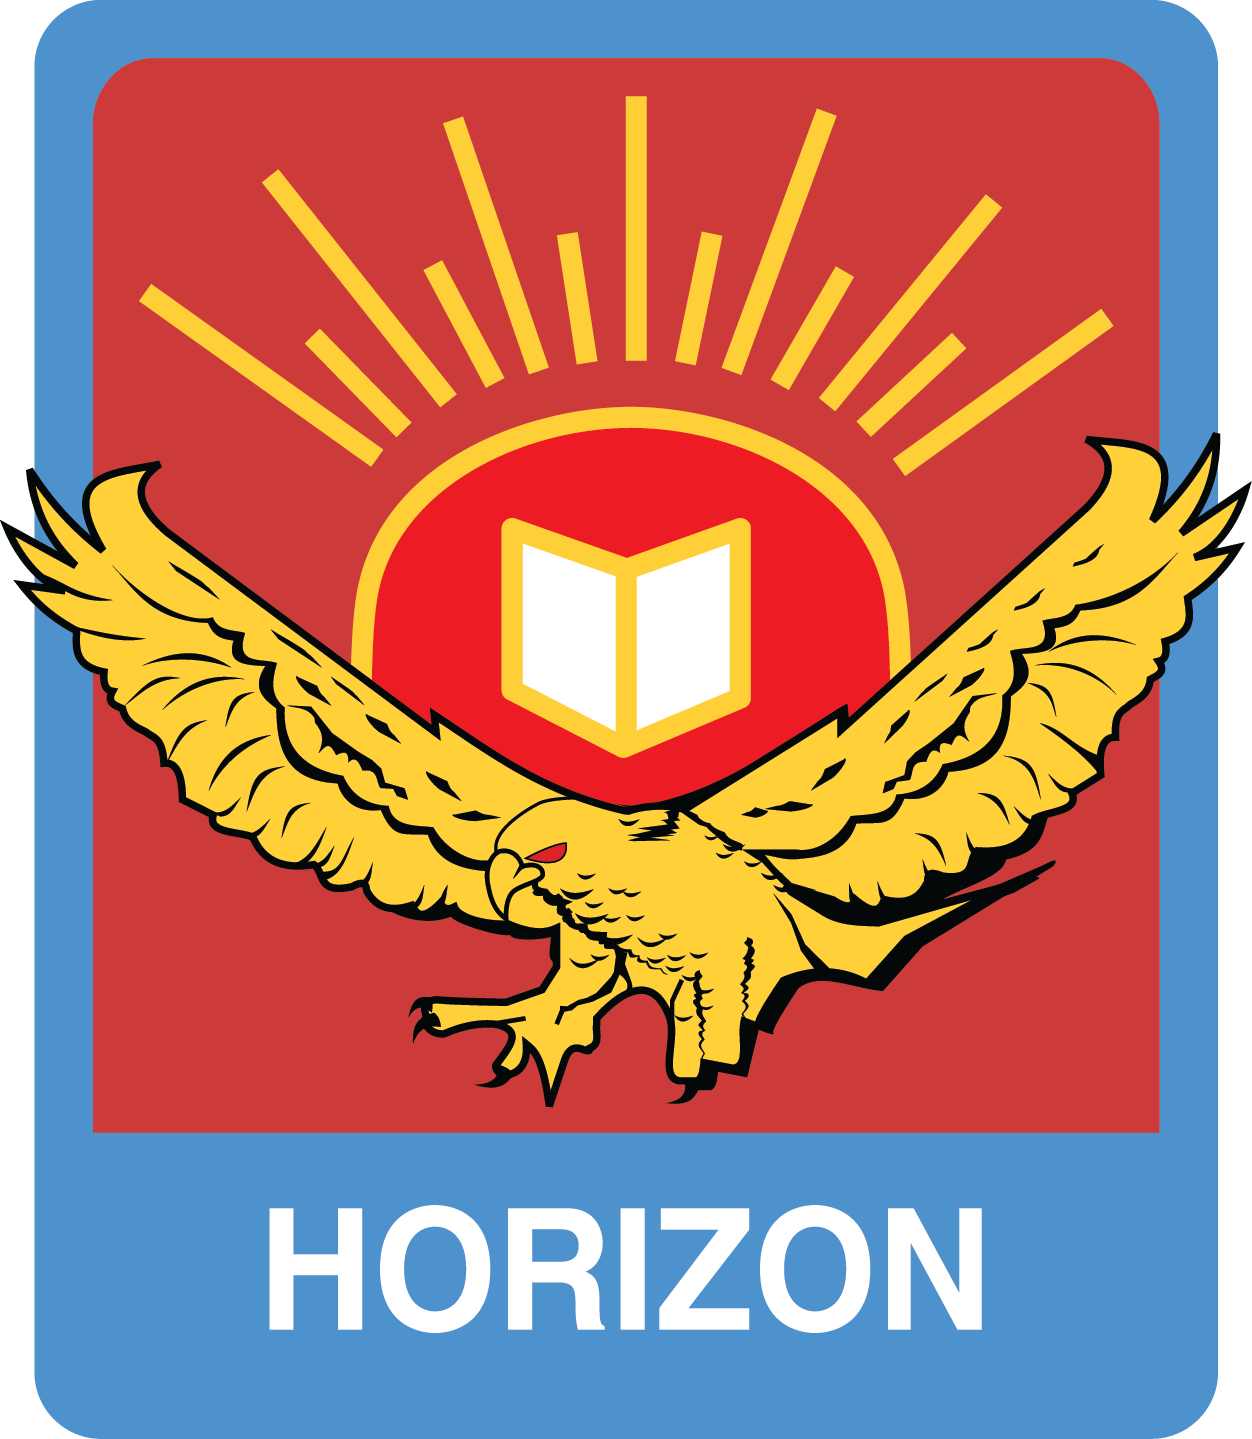 About Horizon